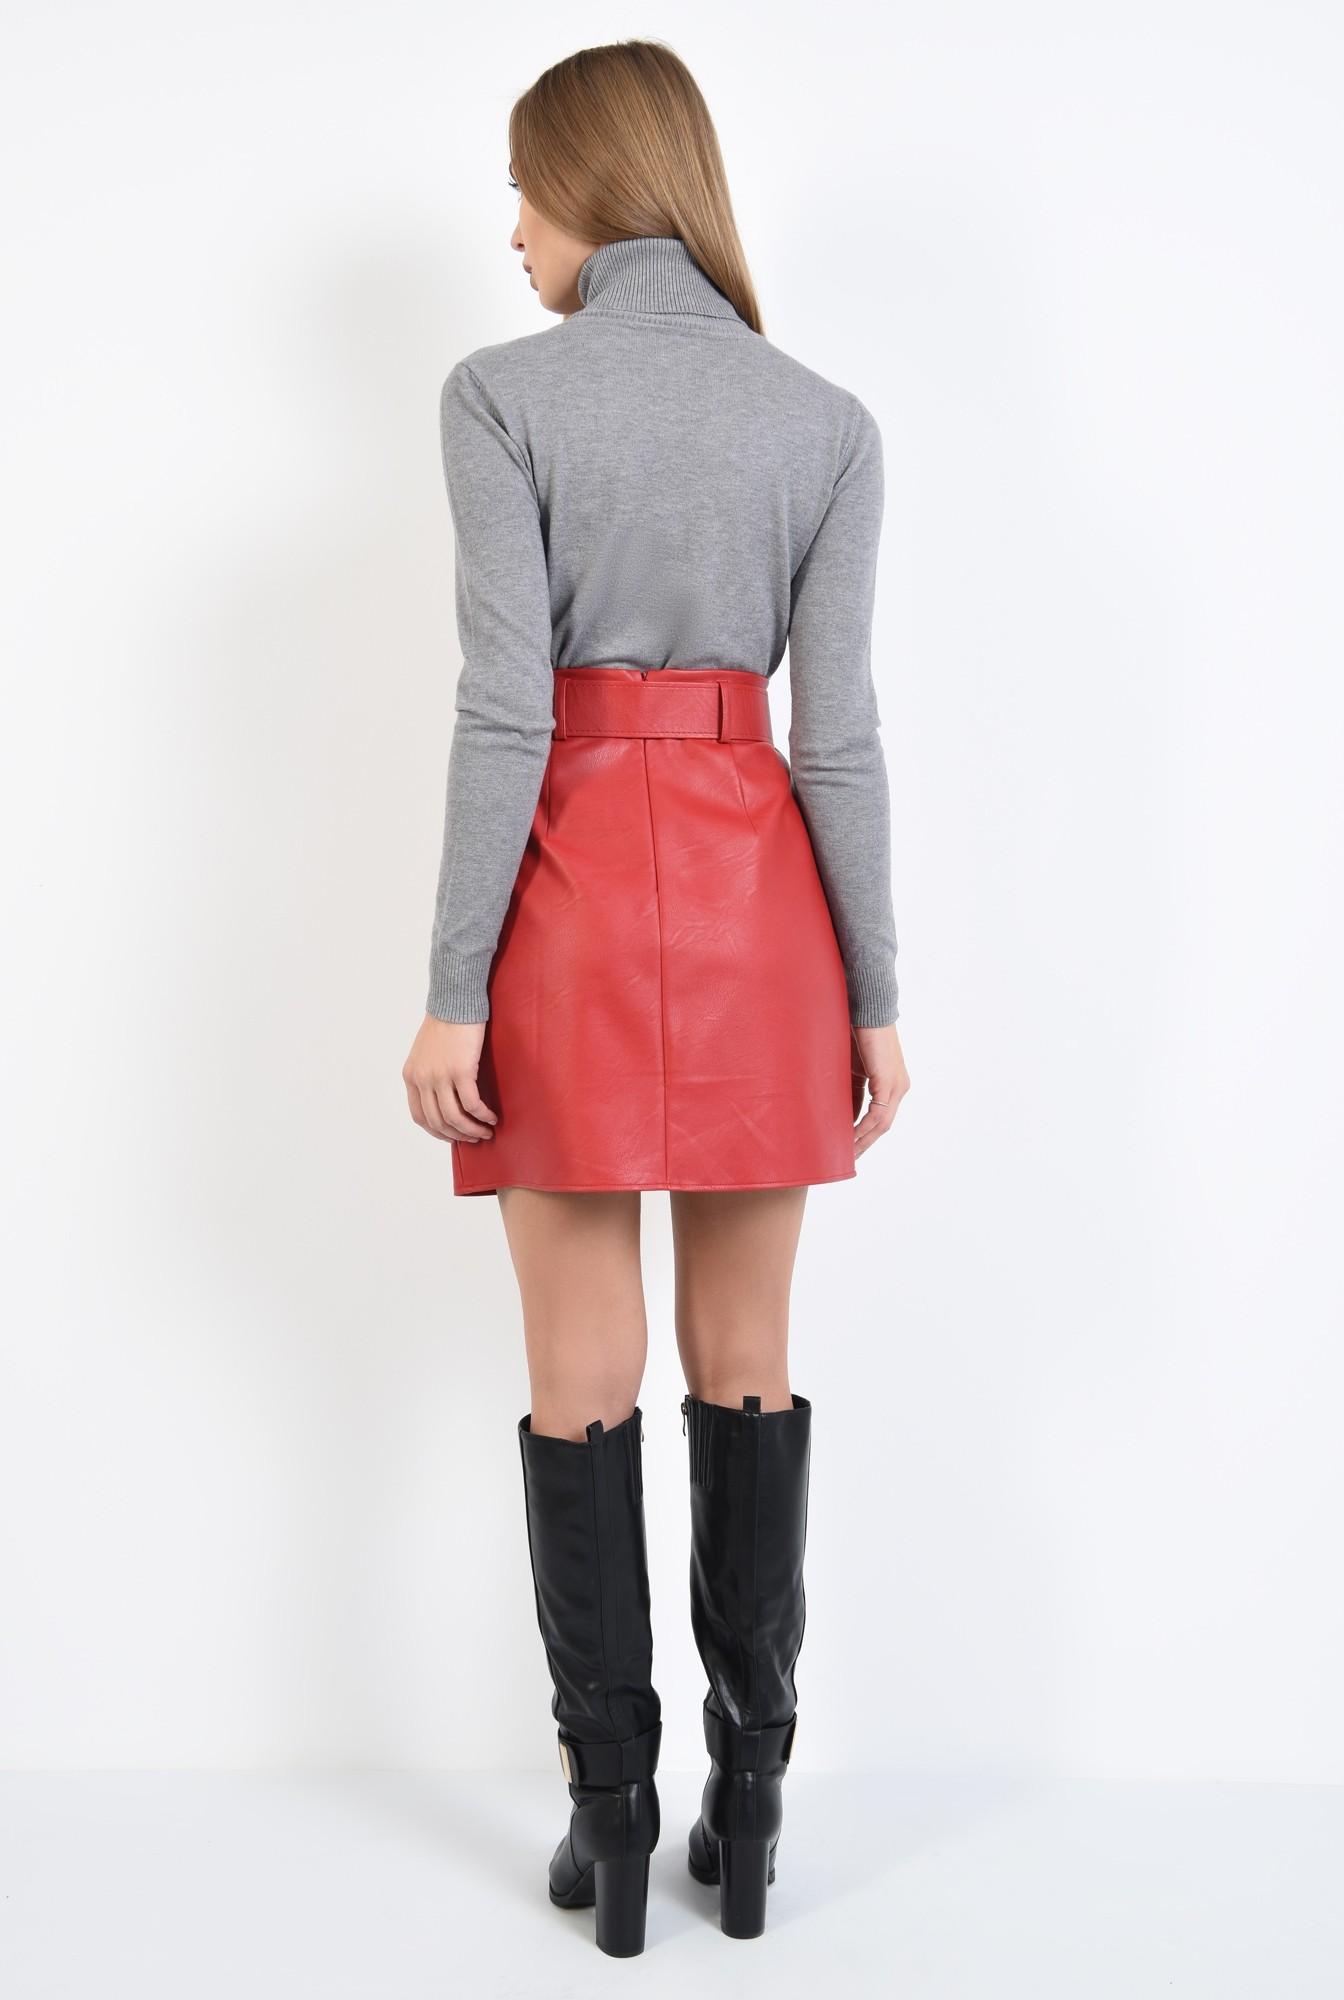 1 - pulover tip maleta, gri, borduri reiate, guler inalt, bluza tricotata